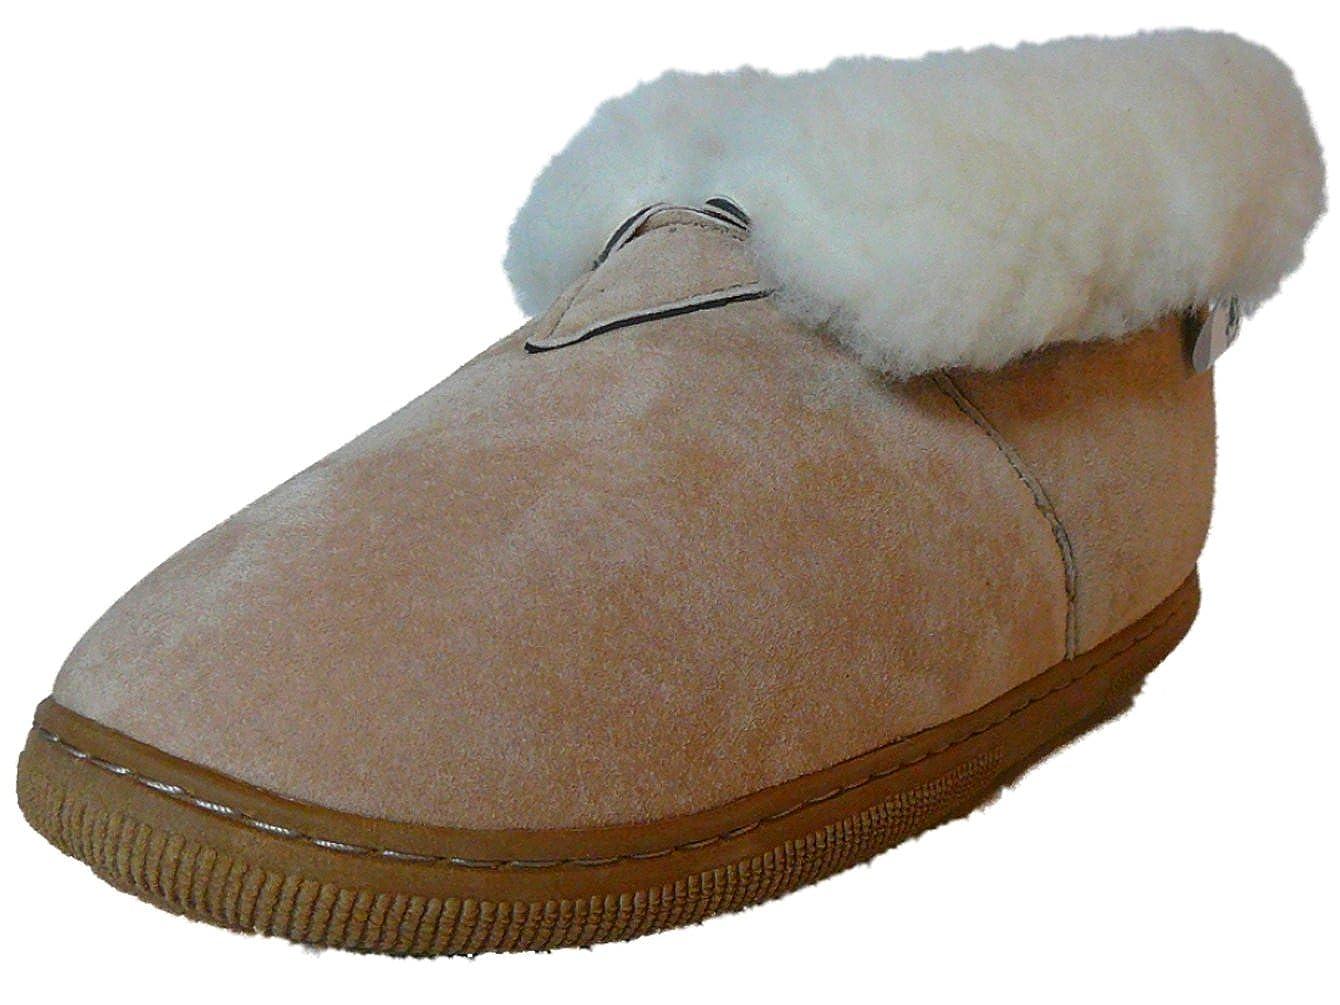 f2bcdcbc318c8 Amazon.com | WoolWorks Model 9813 Womens Genuine Australian Shearling  Sheepskin/Suede Booties | Slippers